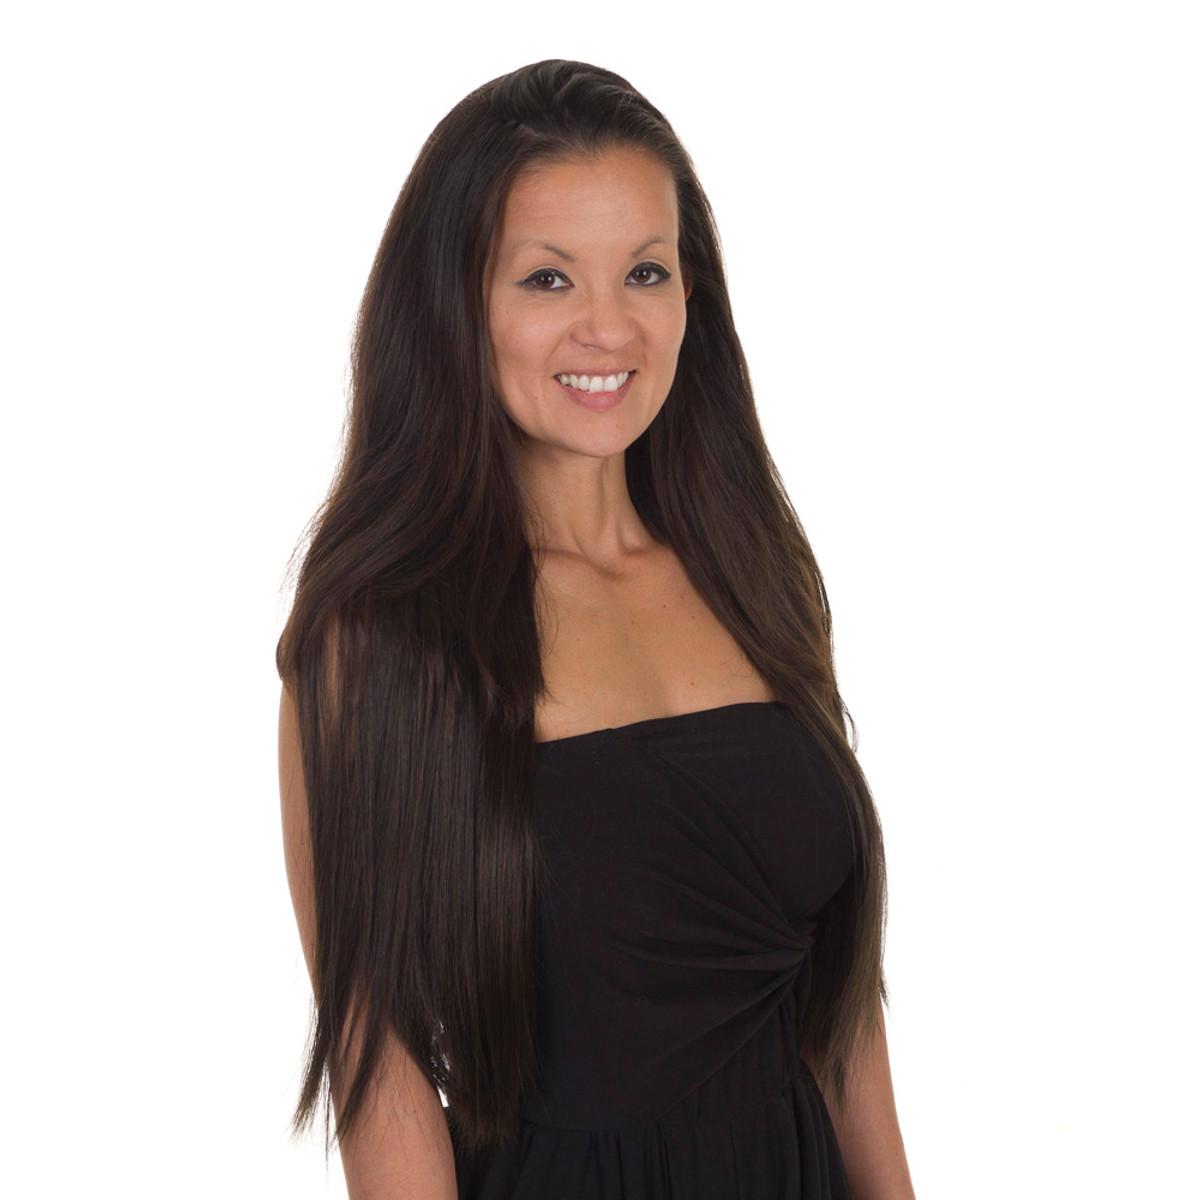 Click Flick Straight 22 Hair Extension Weft 6 Shades